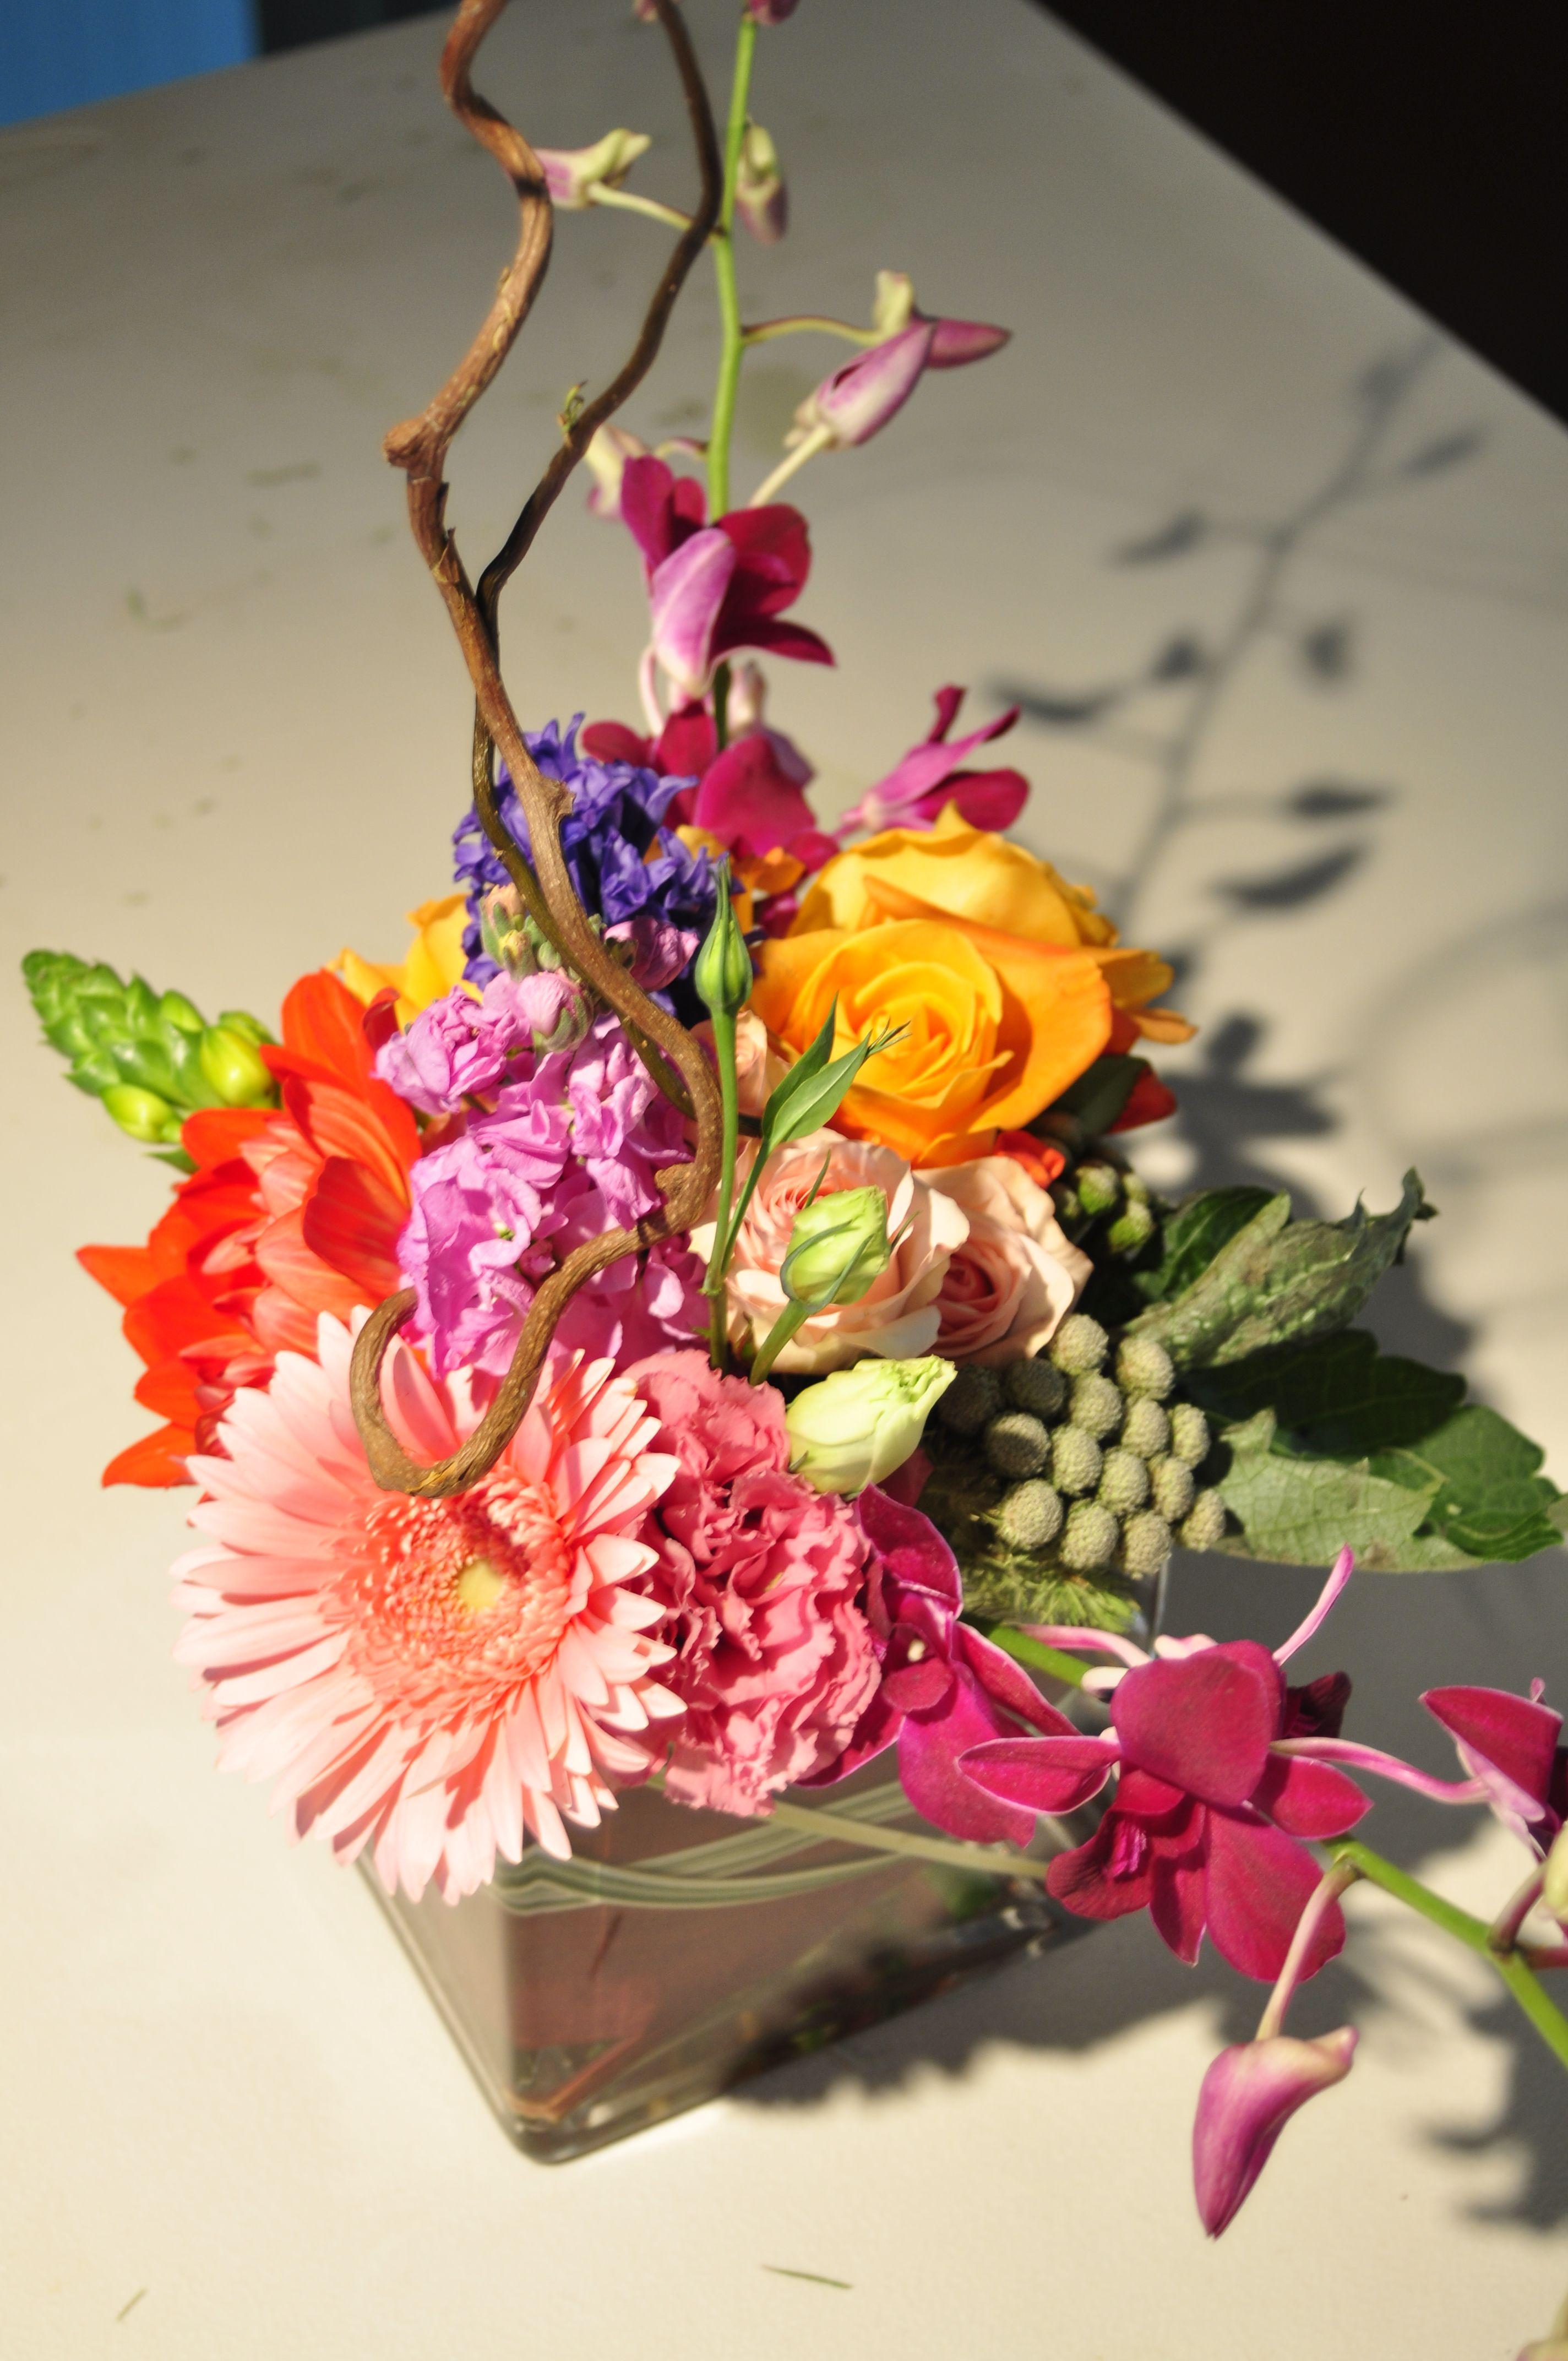 The Twisted Tulip Denver Co Fresh Flower Delivery Flower Delivery Flower Arrangements